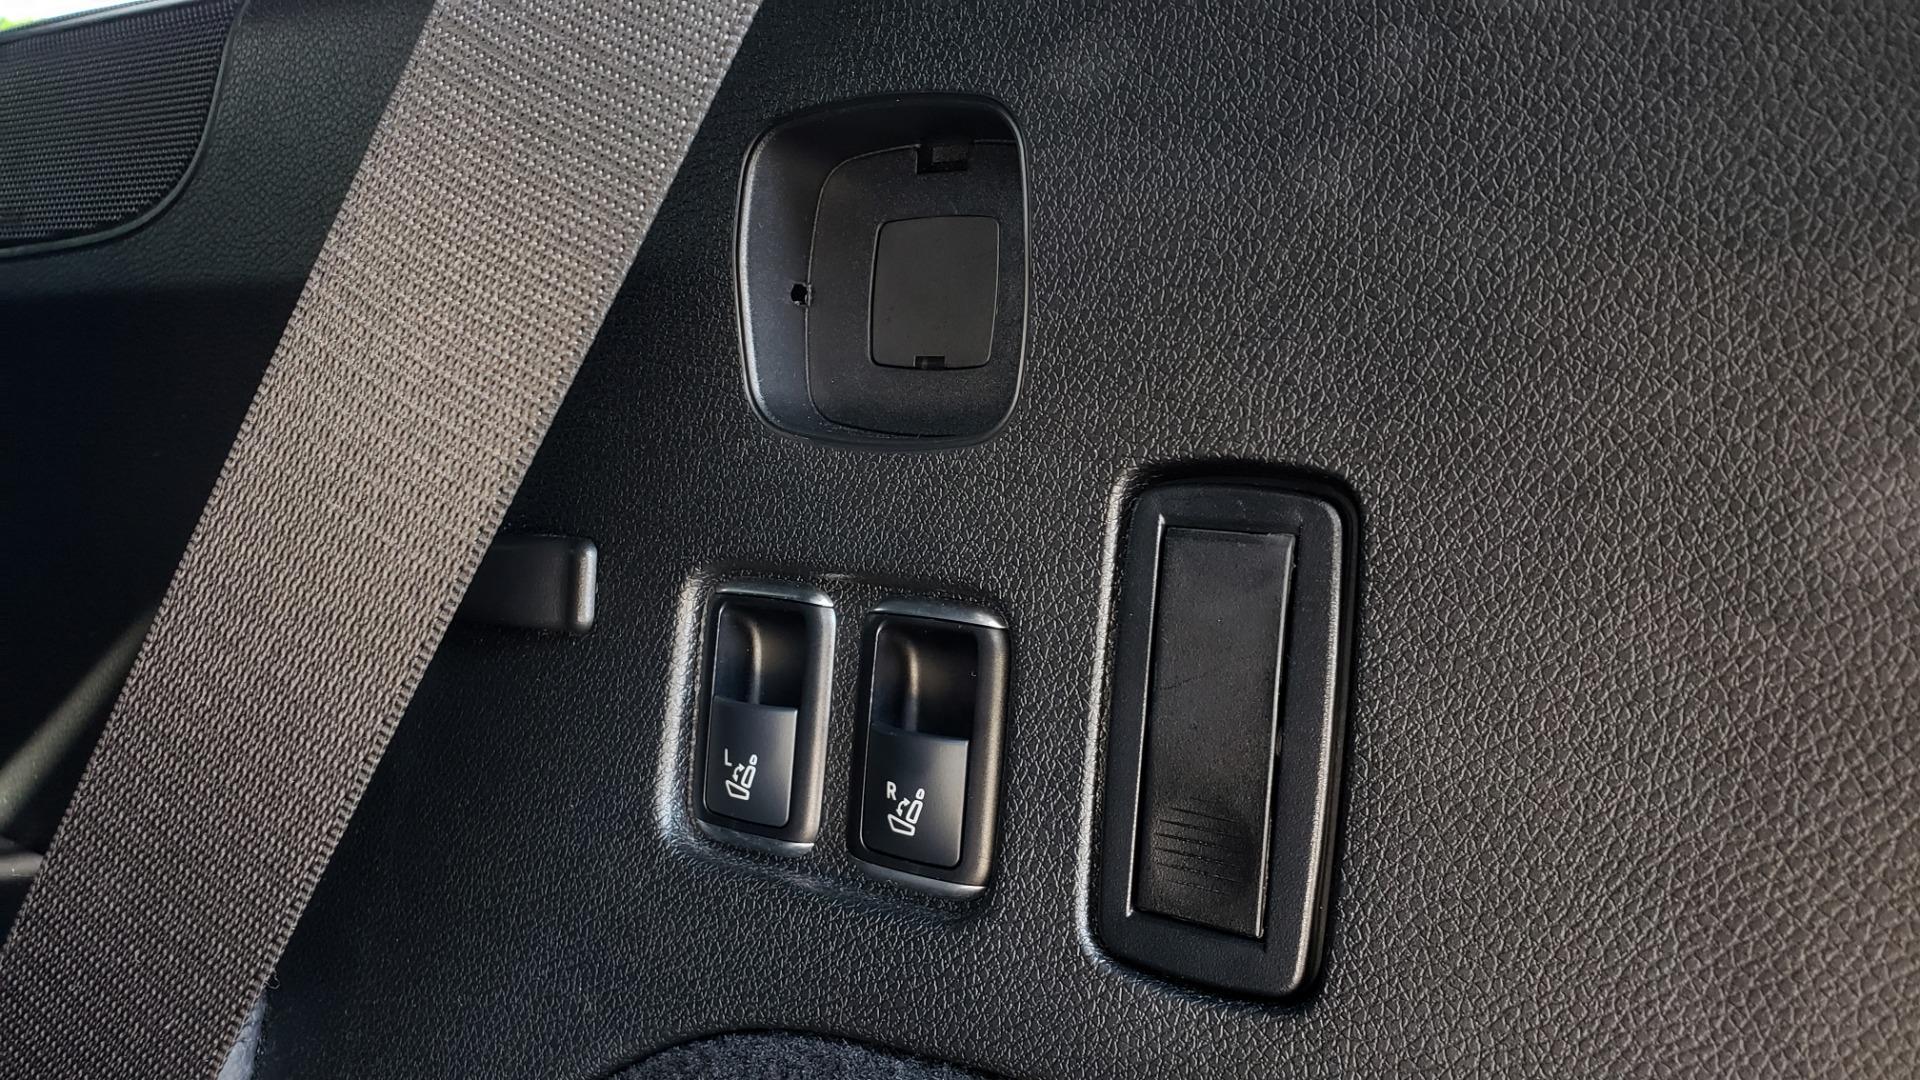 Used 2017 Mercedes-Benz GLS GLS 550 for sale Sold at Formula Imports in Charlotte NC 28227 17